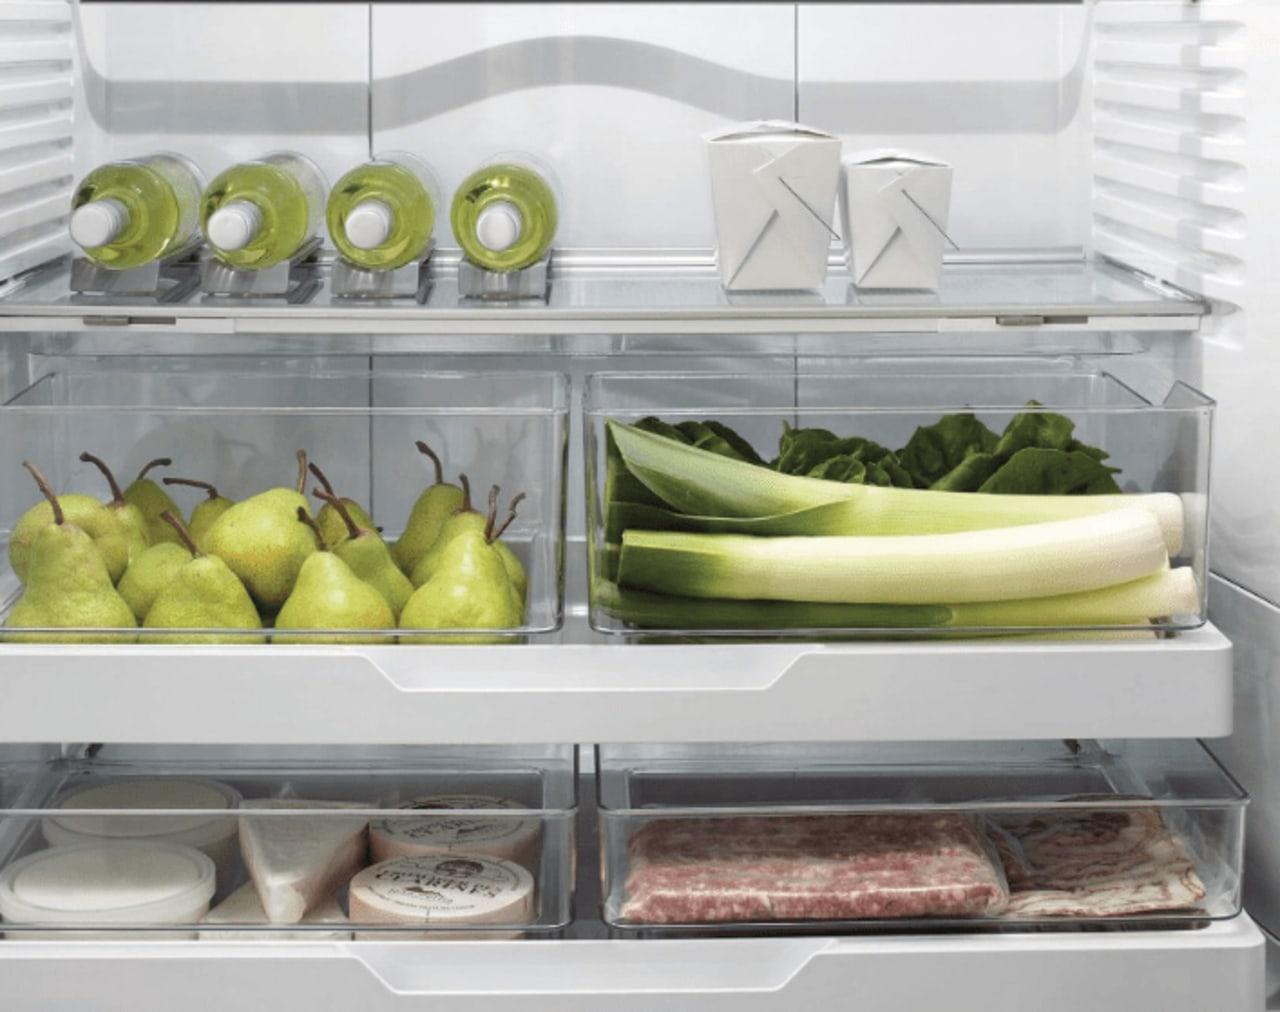 Certain smart fridges adjust things like temperature, airflow food, produce, vegetable, gray, white